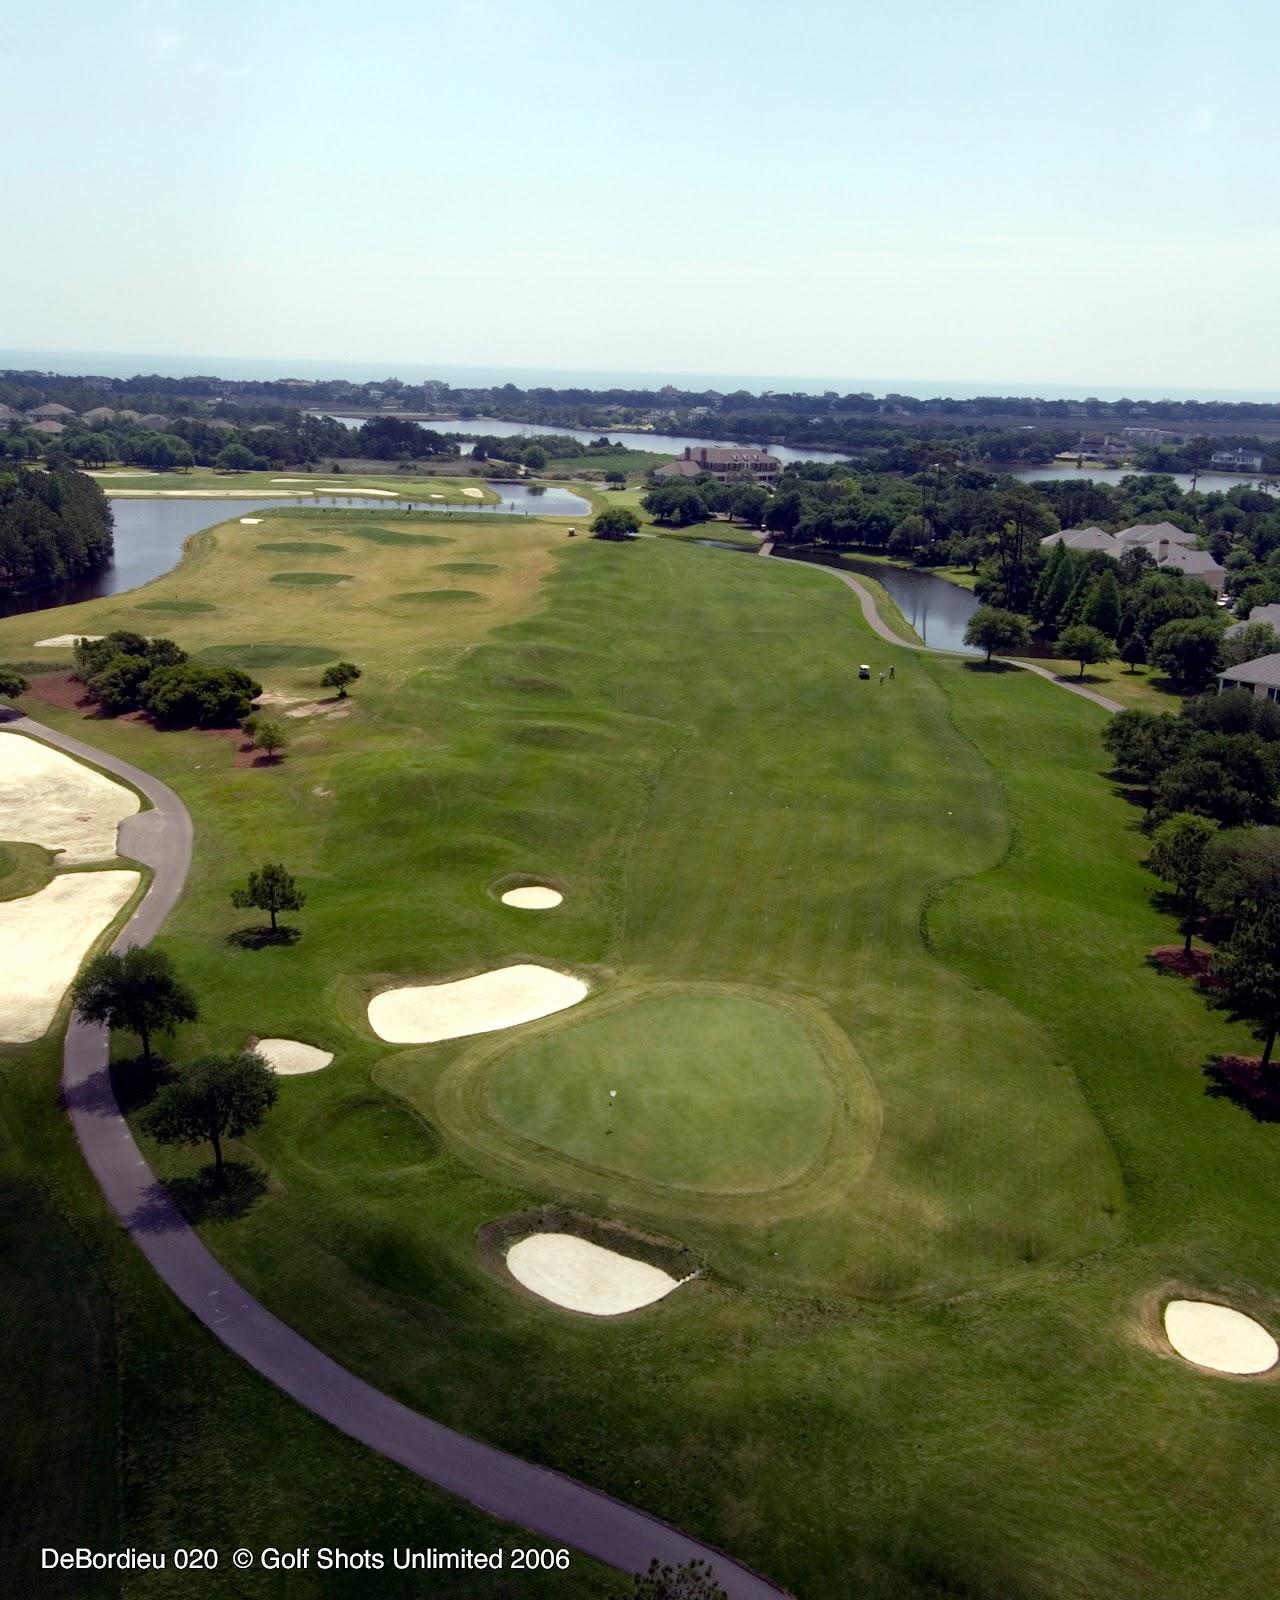 Golf Course Clubhouse Interior Design Ideas: DeBordieu Golf Club Hole #1